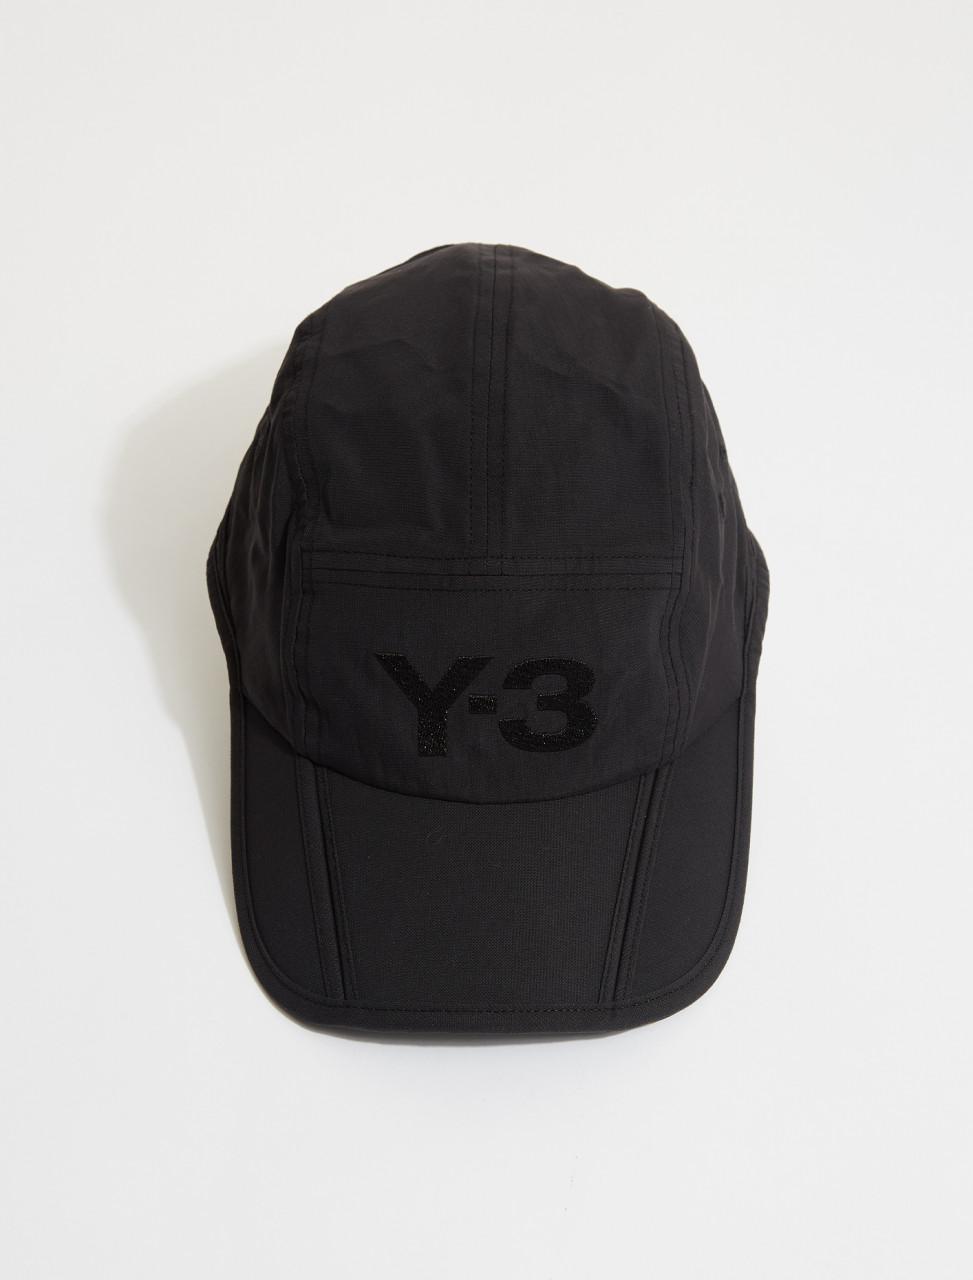 165-FQ6984 Y-3 FOLDABLE CAP BLACK